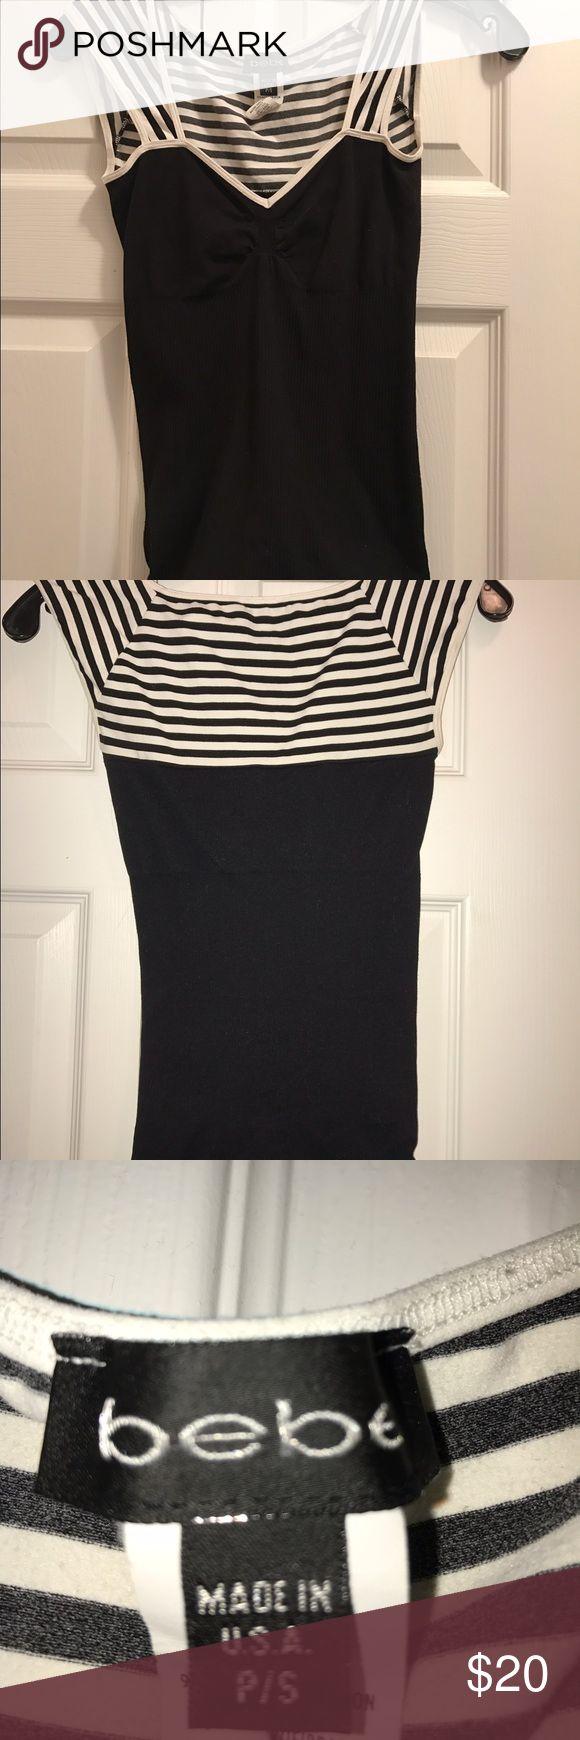 Bebe Bodycon Top Striped Bebe Tshirt Body Con Top bebe Tops Tees - Short Sleeve